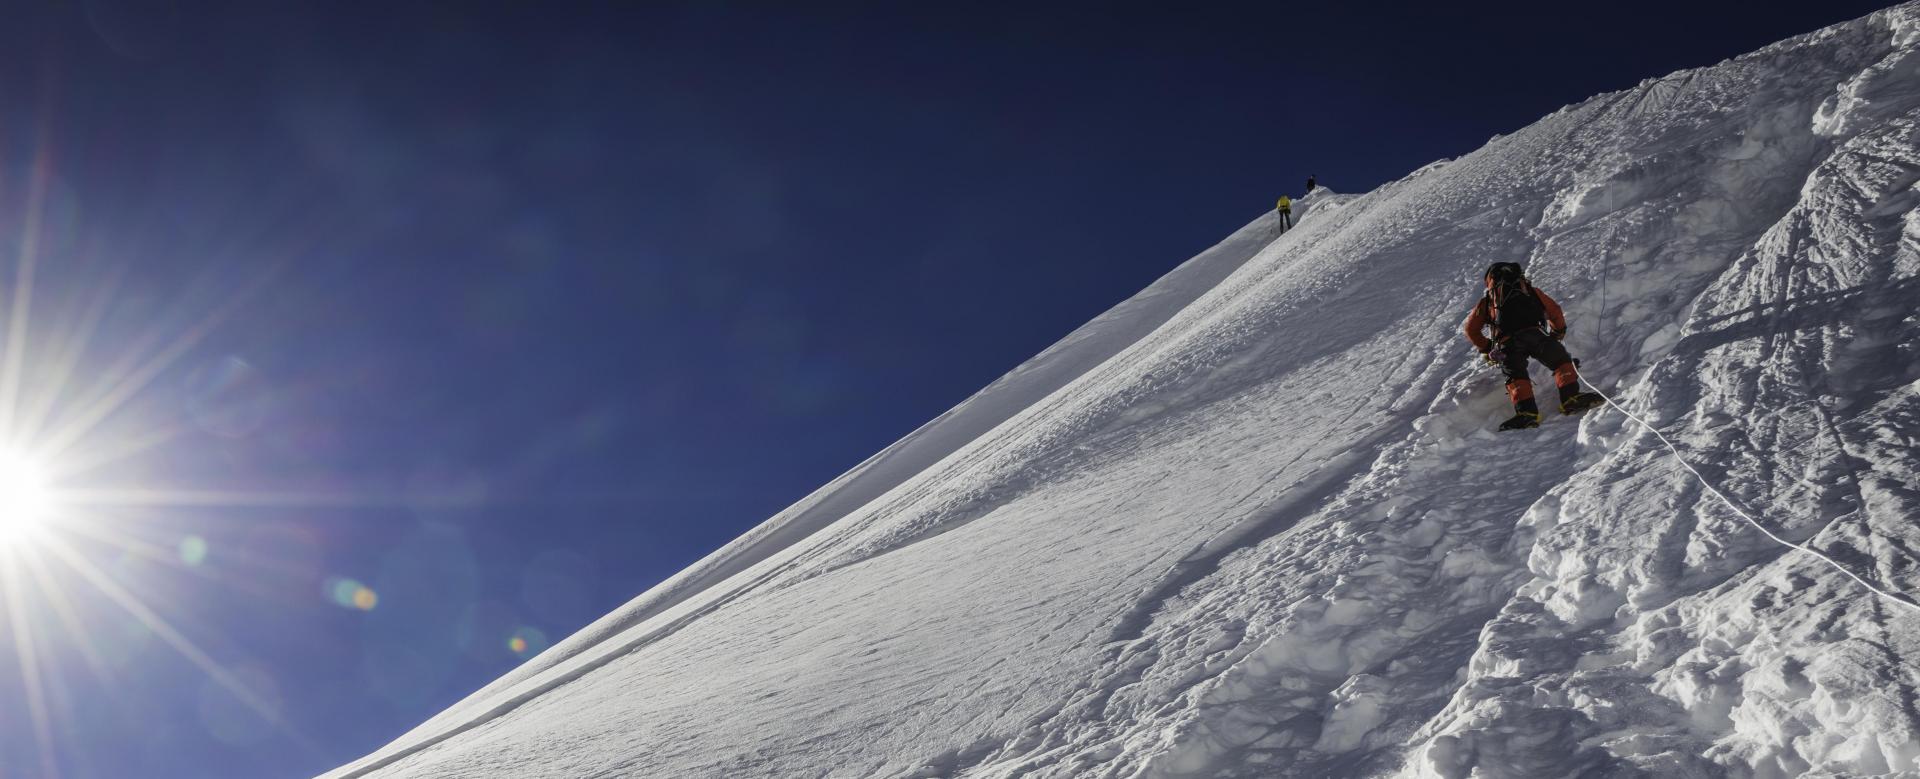 Voyage à pied Nepal : Himlung himal (7140 m)